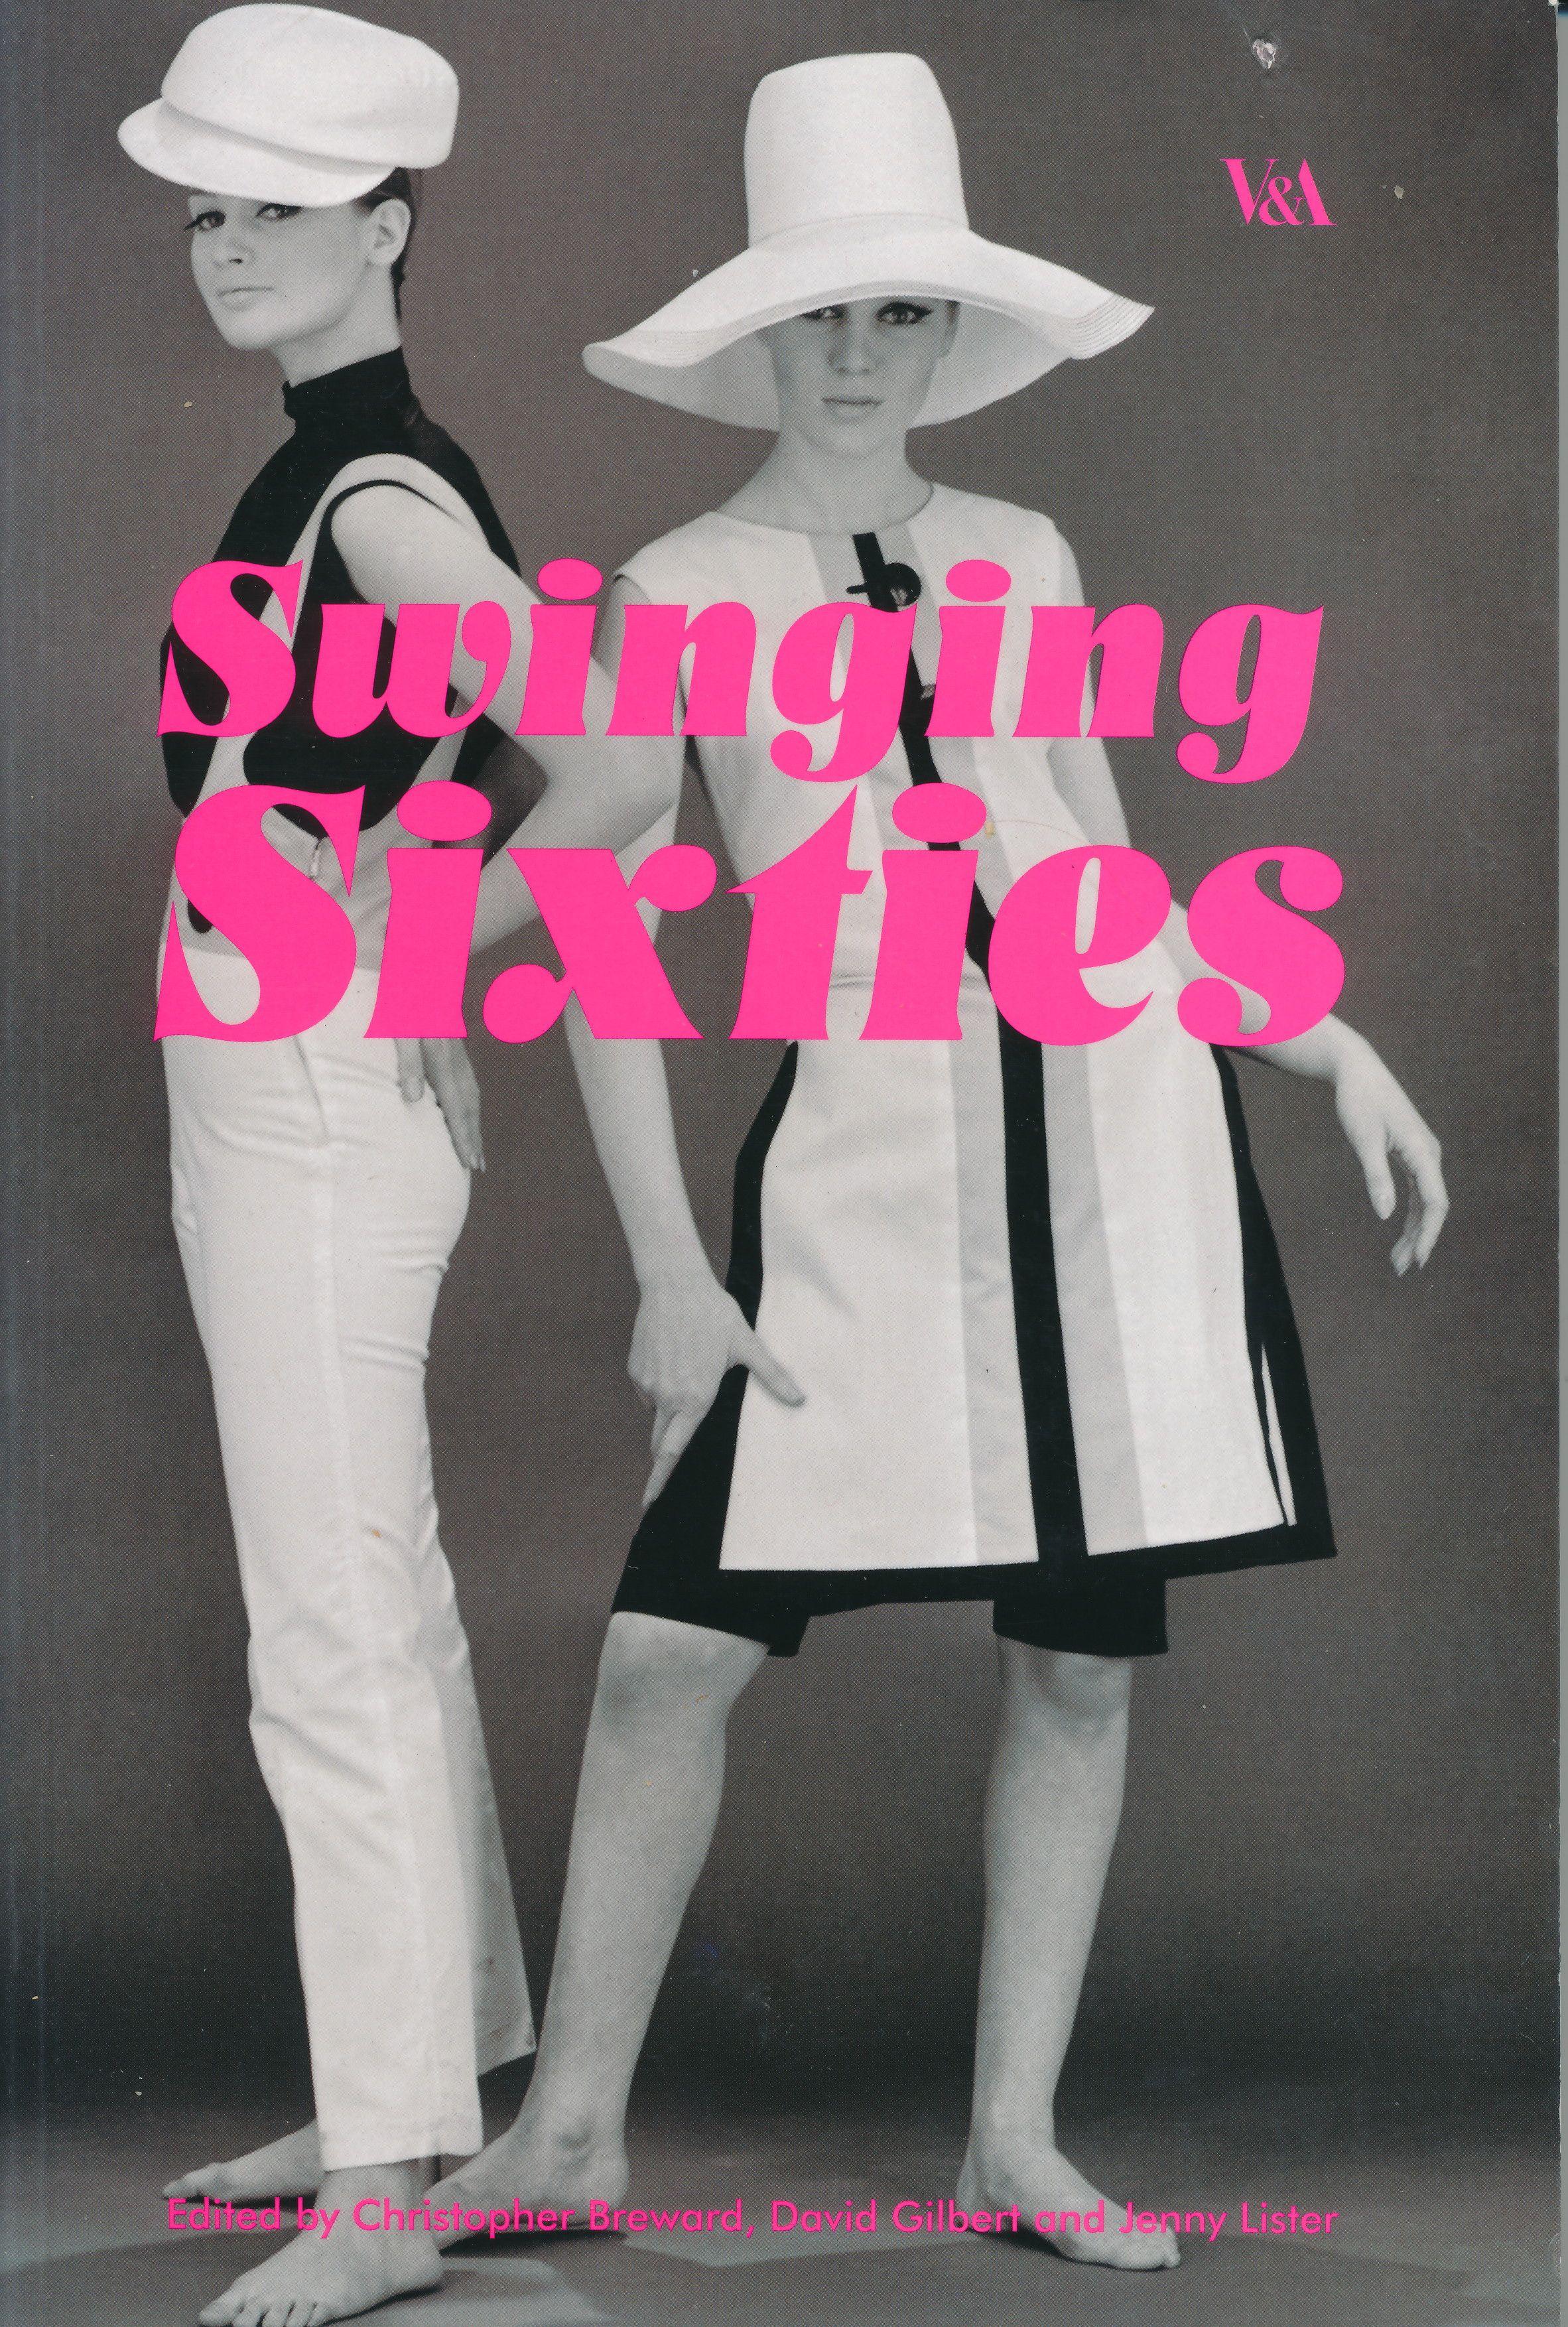 Swinging Sixties: British Fashion - Now & Then